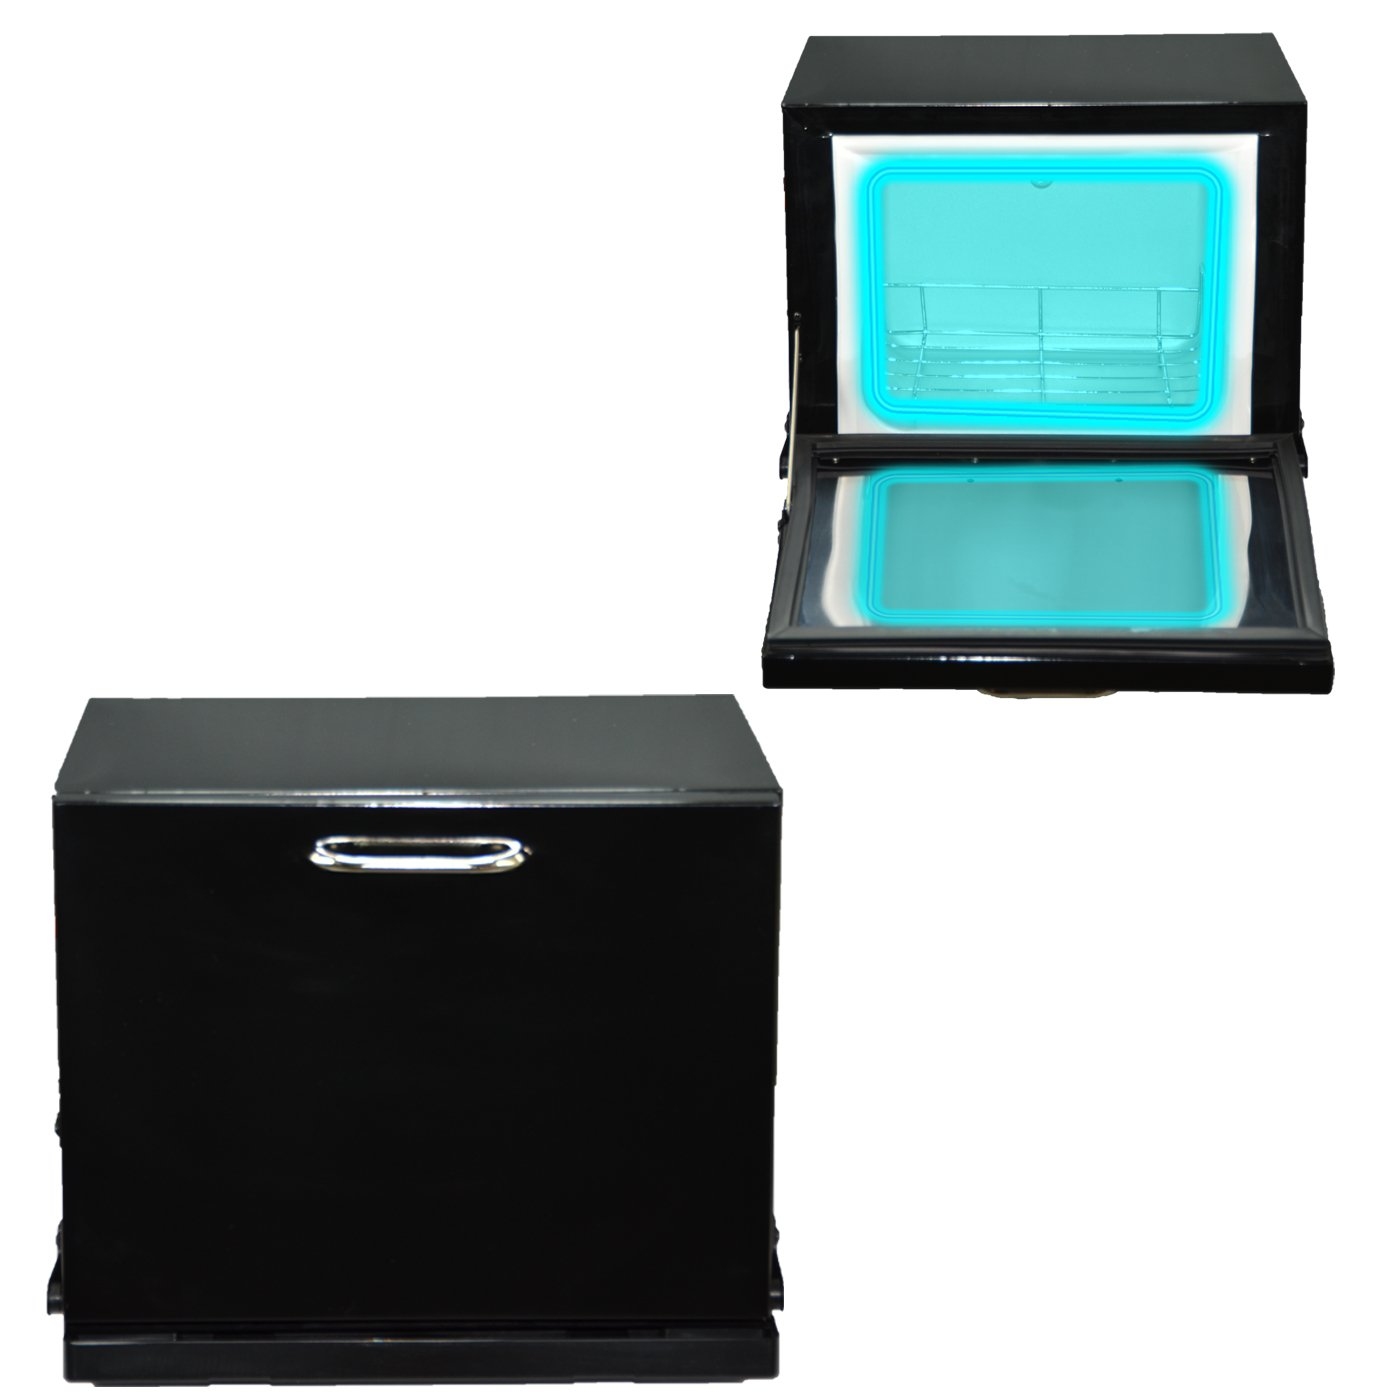 LCL Beauty Black Compact 2-in-1 Towel Warmer & Ultraviolet Sterilizer Cabinet (w/o Towels)